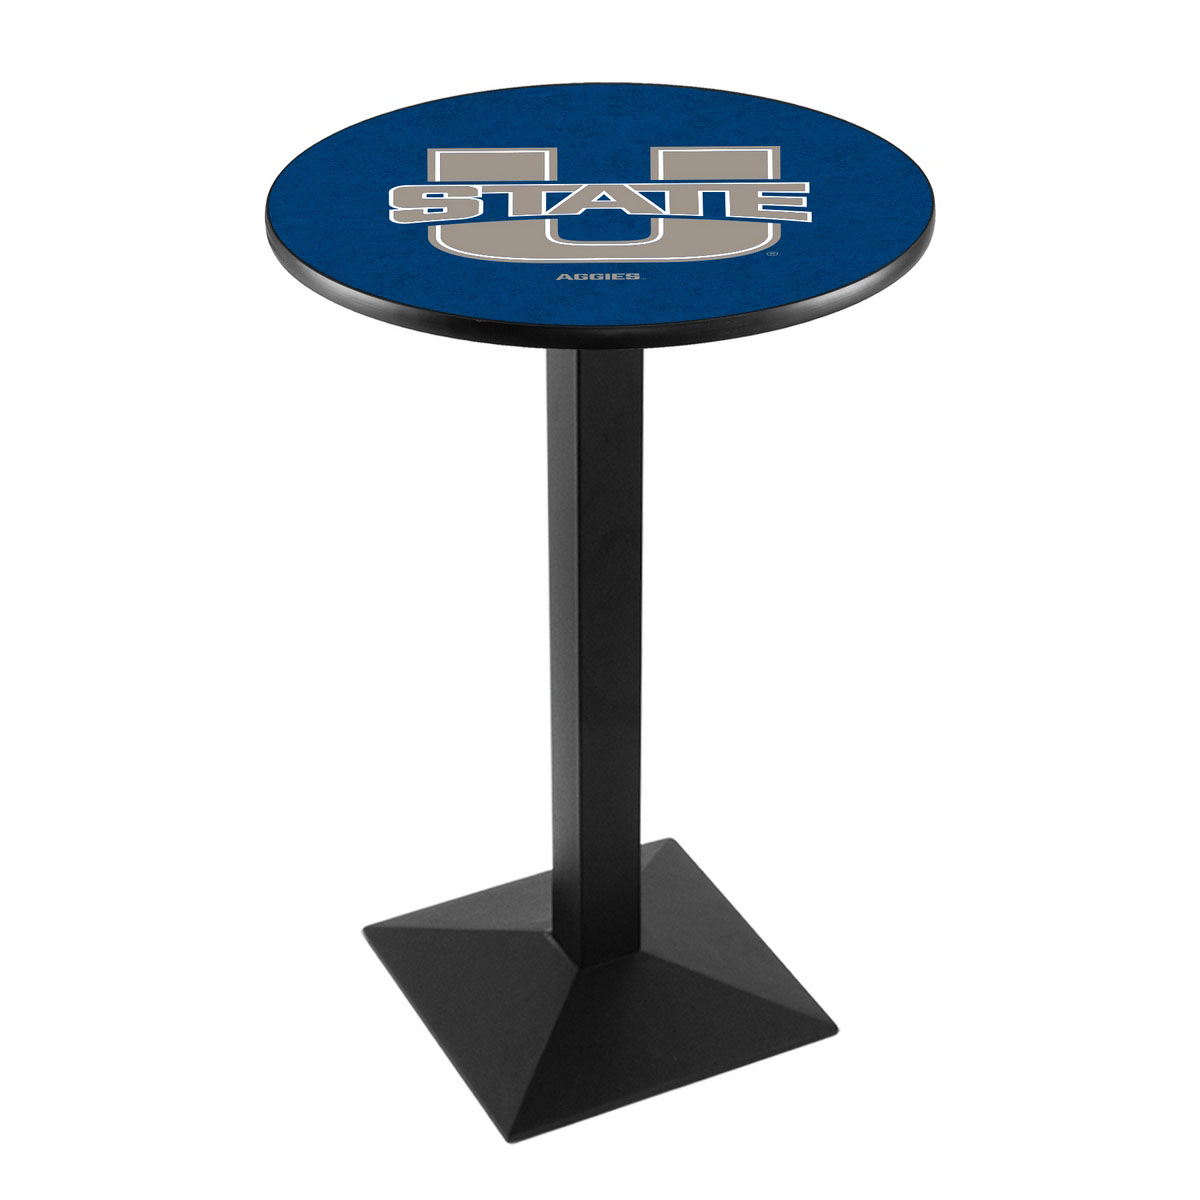 Design Utah State University Logo Pub Bar Table Square Stand Product Photo